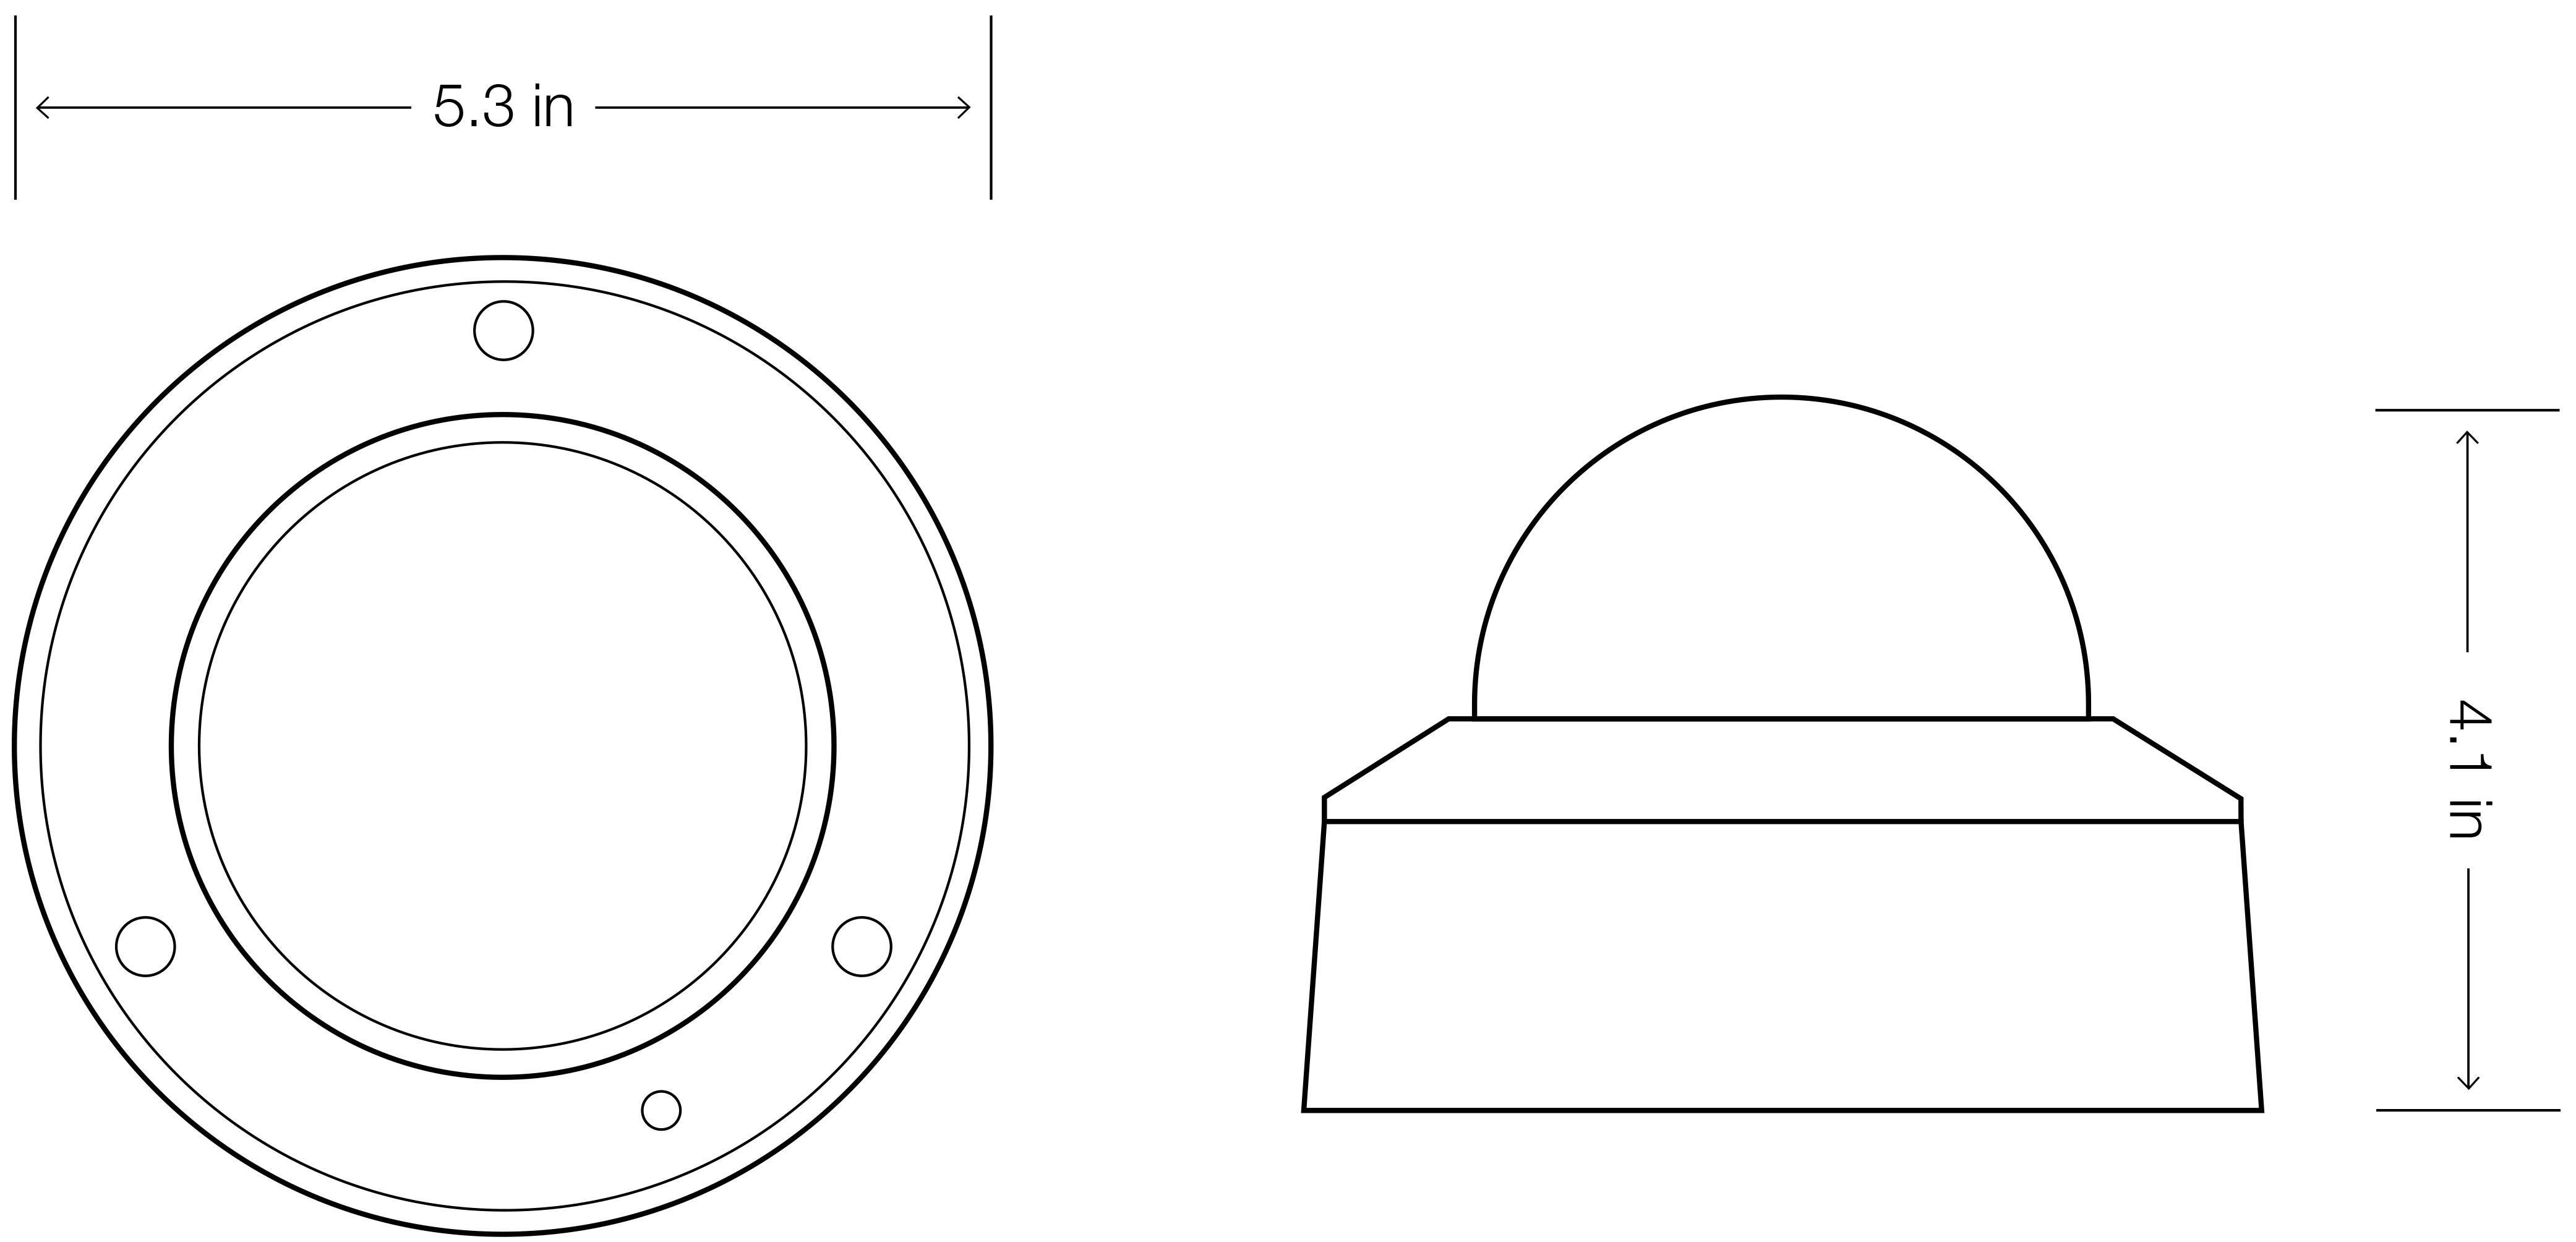 Latch Camera hardware specs